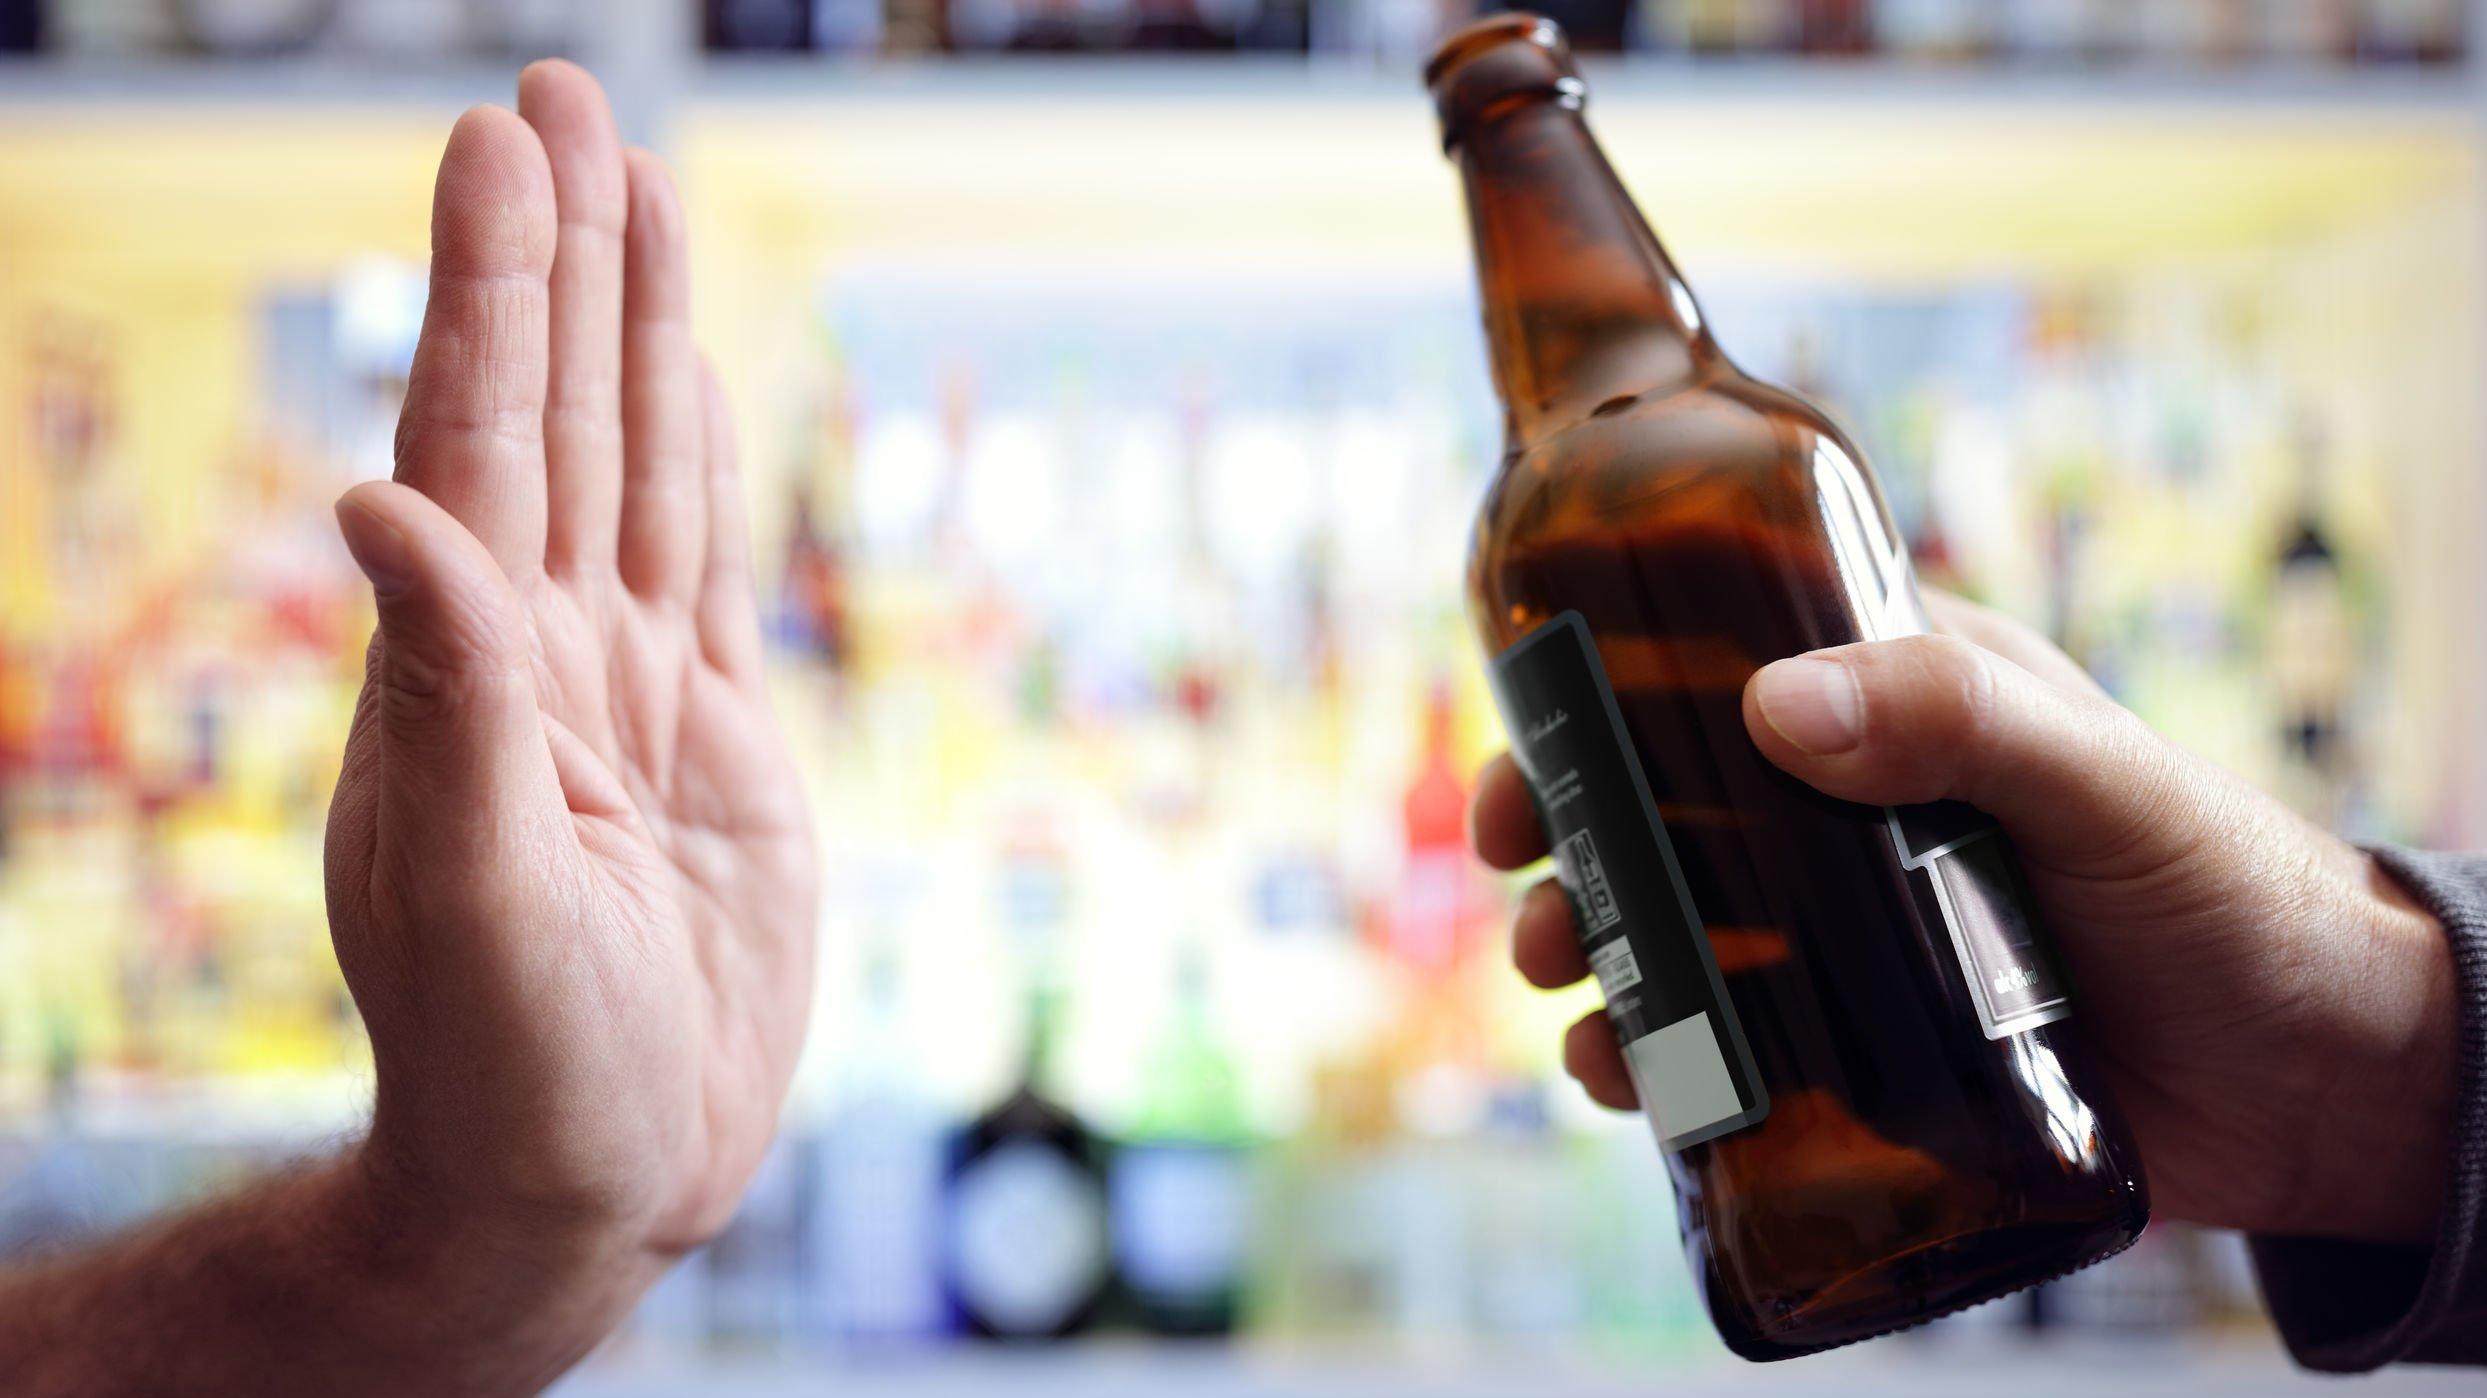 Pessoa negando garrafa de bebida